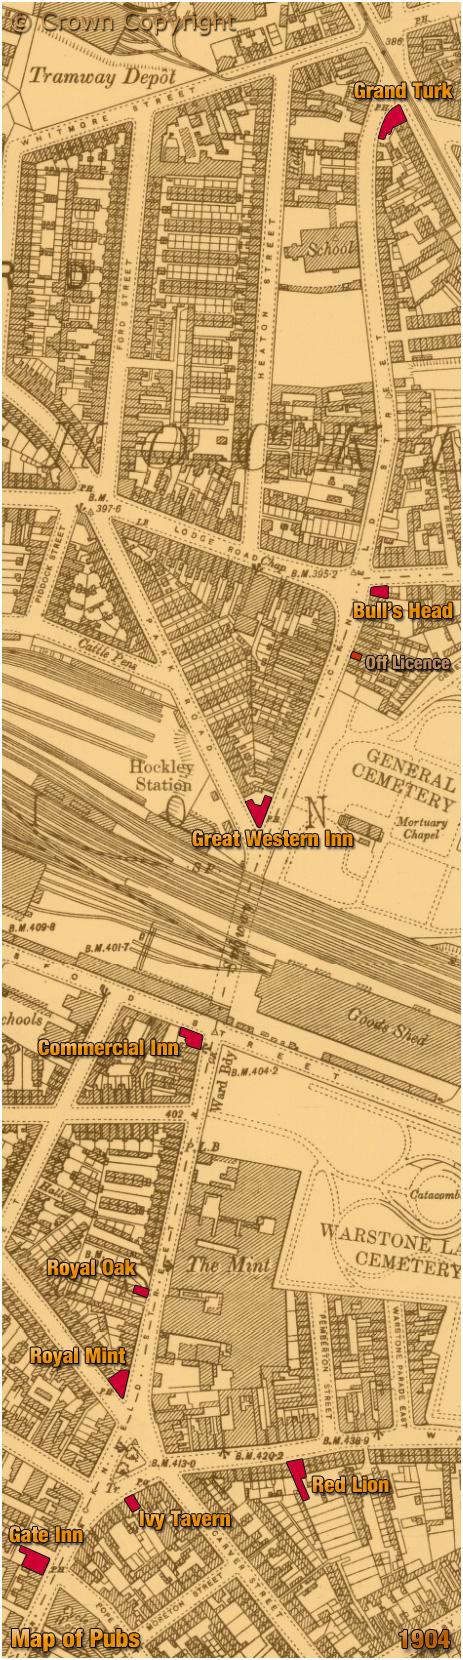 Birmingham : Map of Pubs in Icknield Street in Hockley [1904]